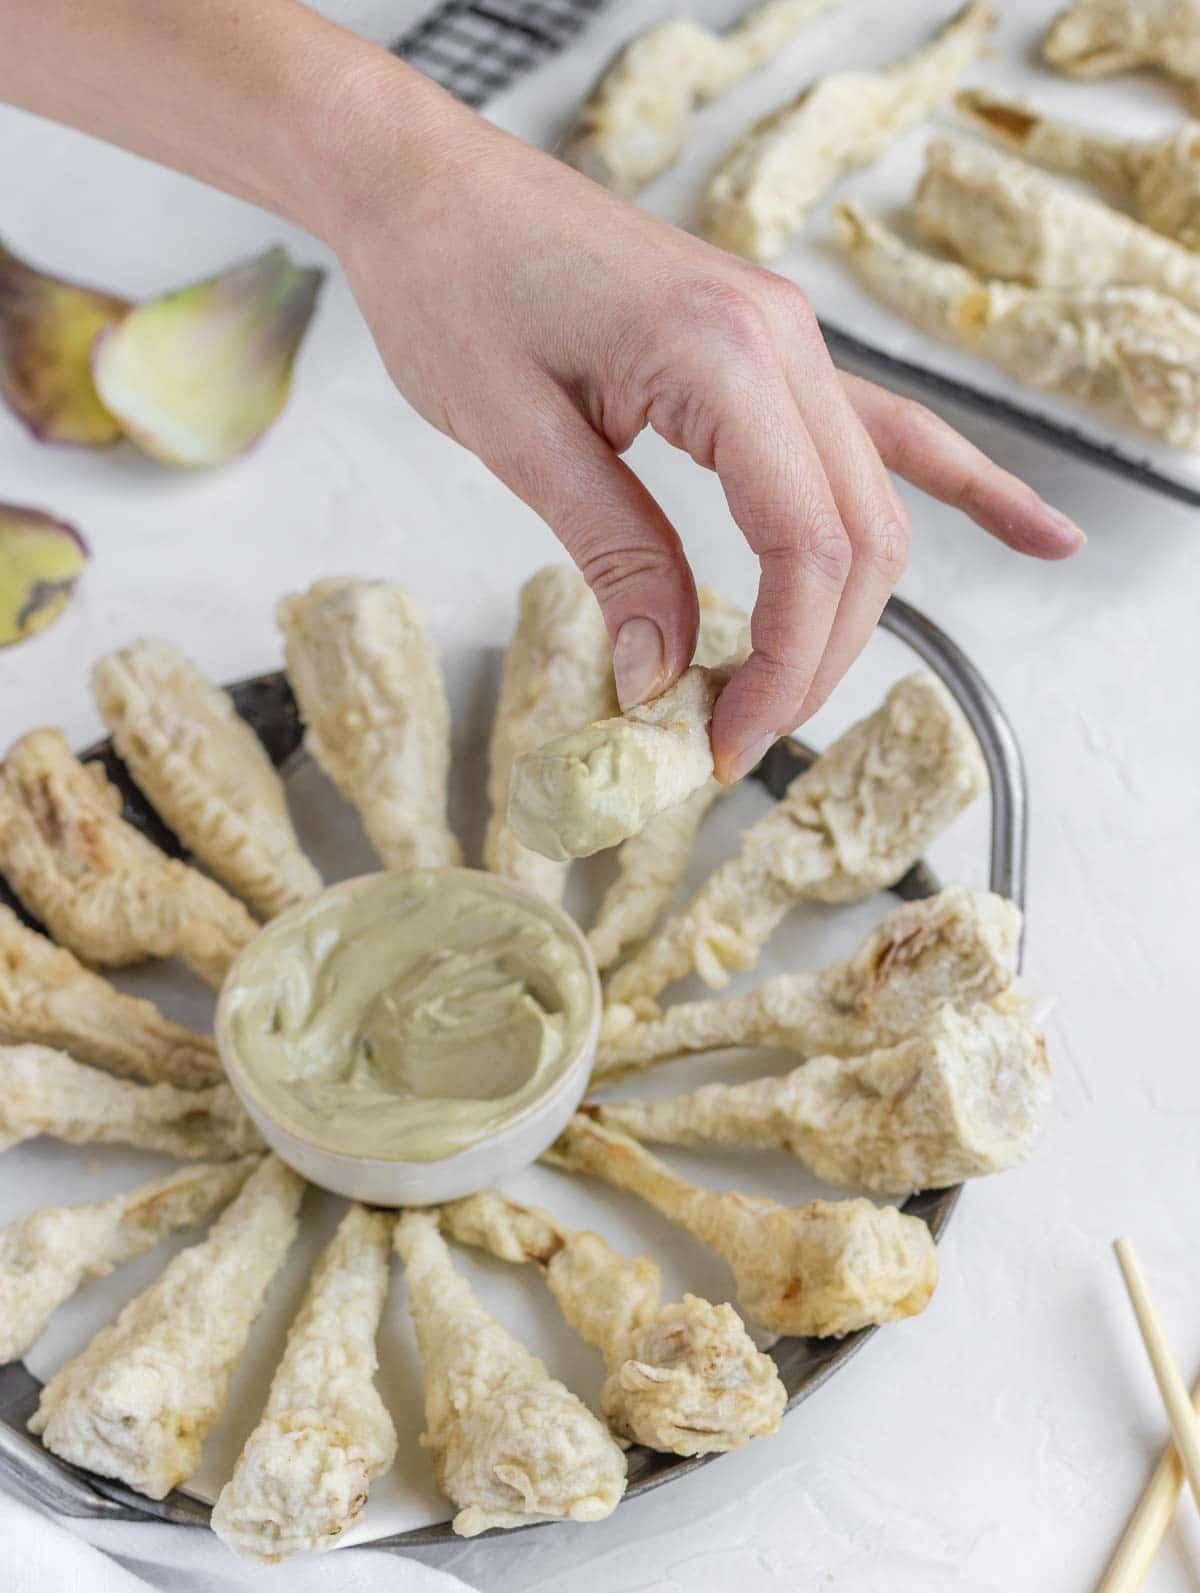 Vegan artichoke mayonnaise